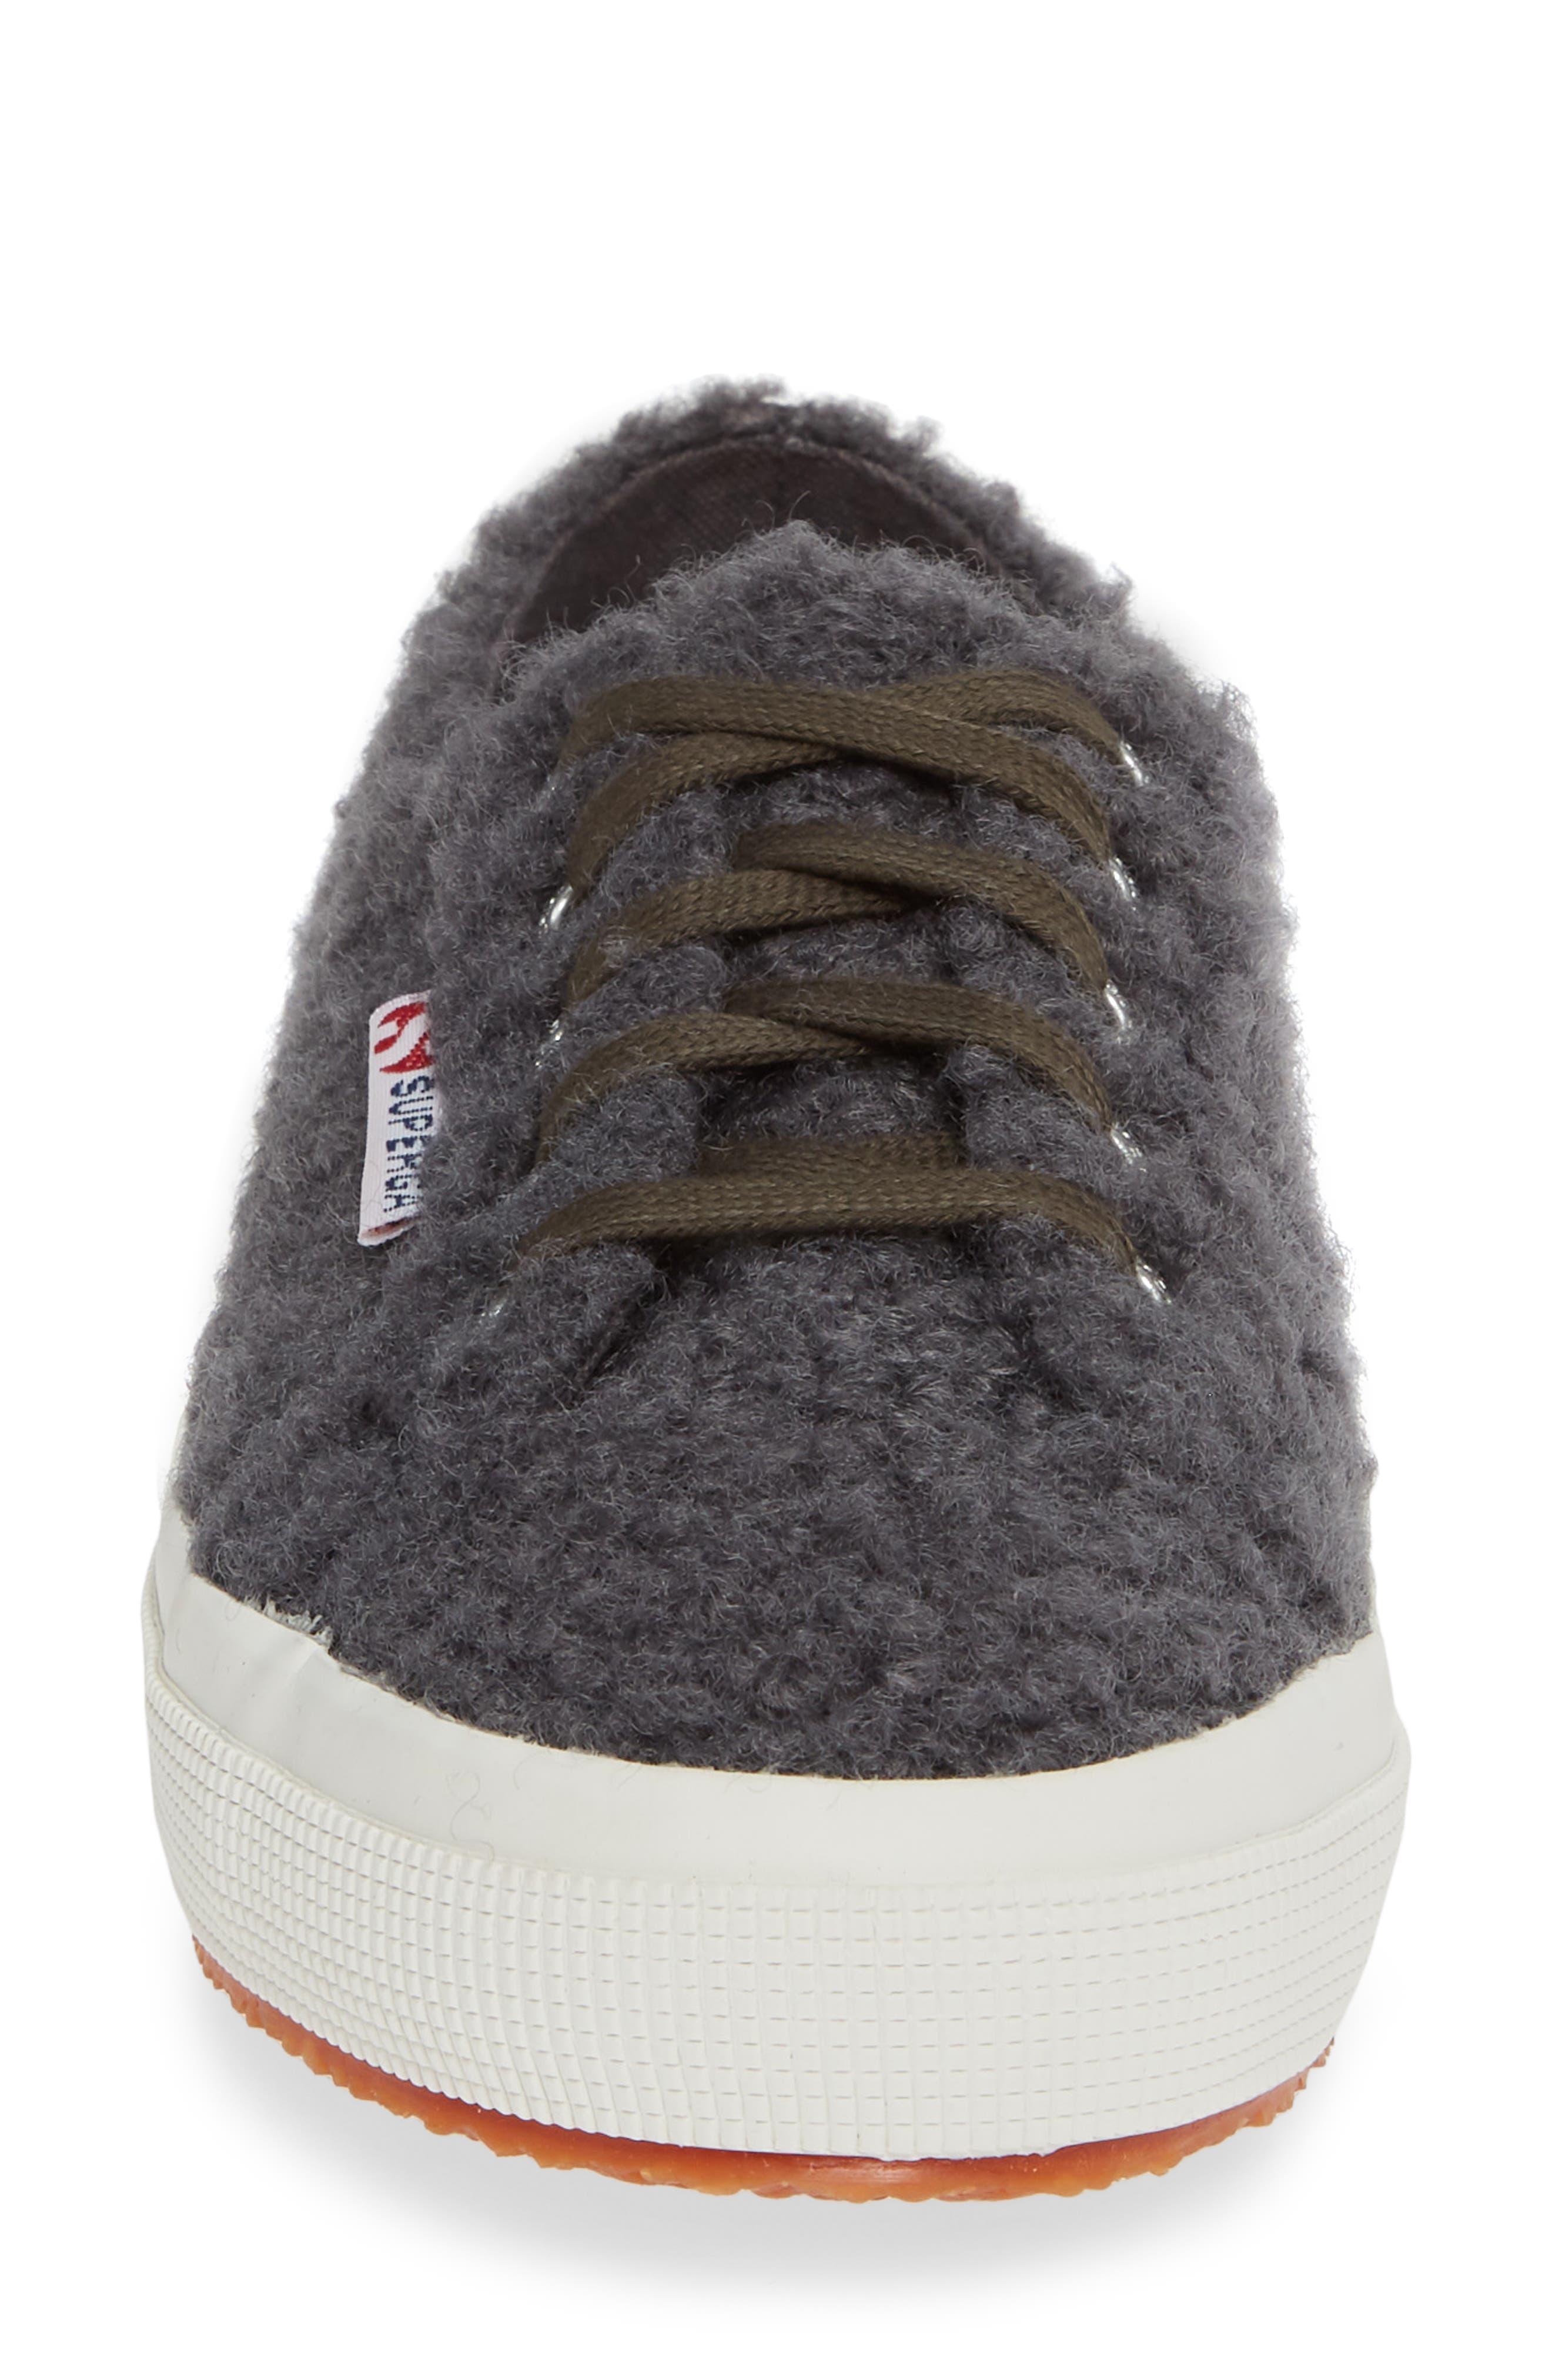 2759 Curly Wool Sneaker,                             Alternate thumbnail 4, color,                             DARK GREY/ GREY